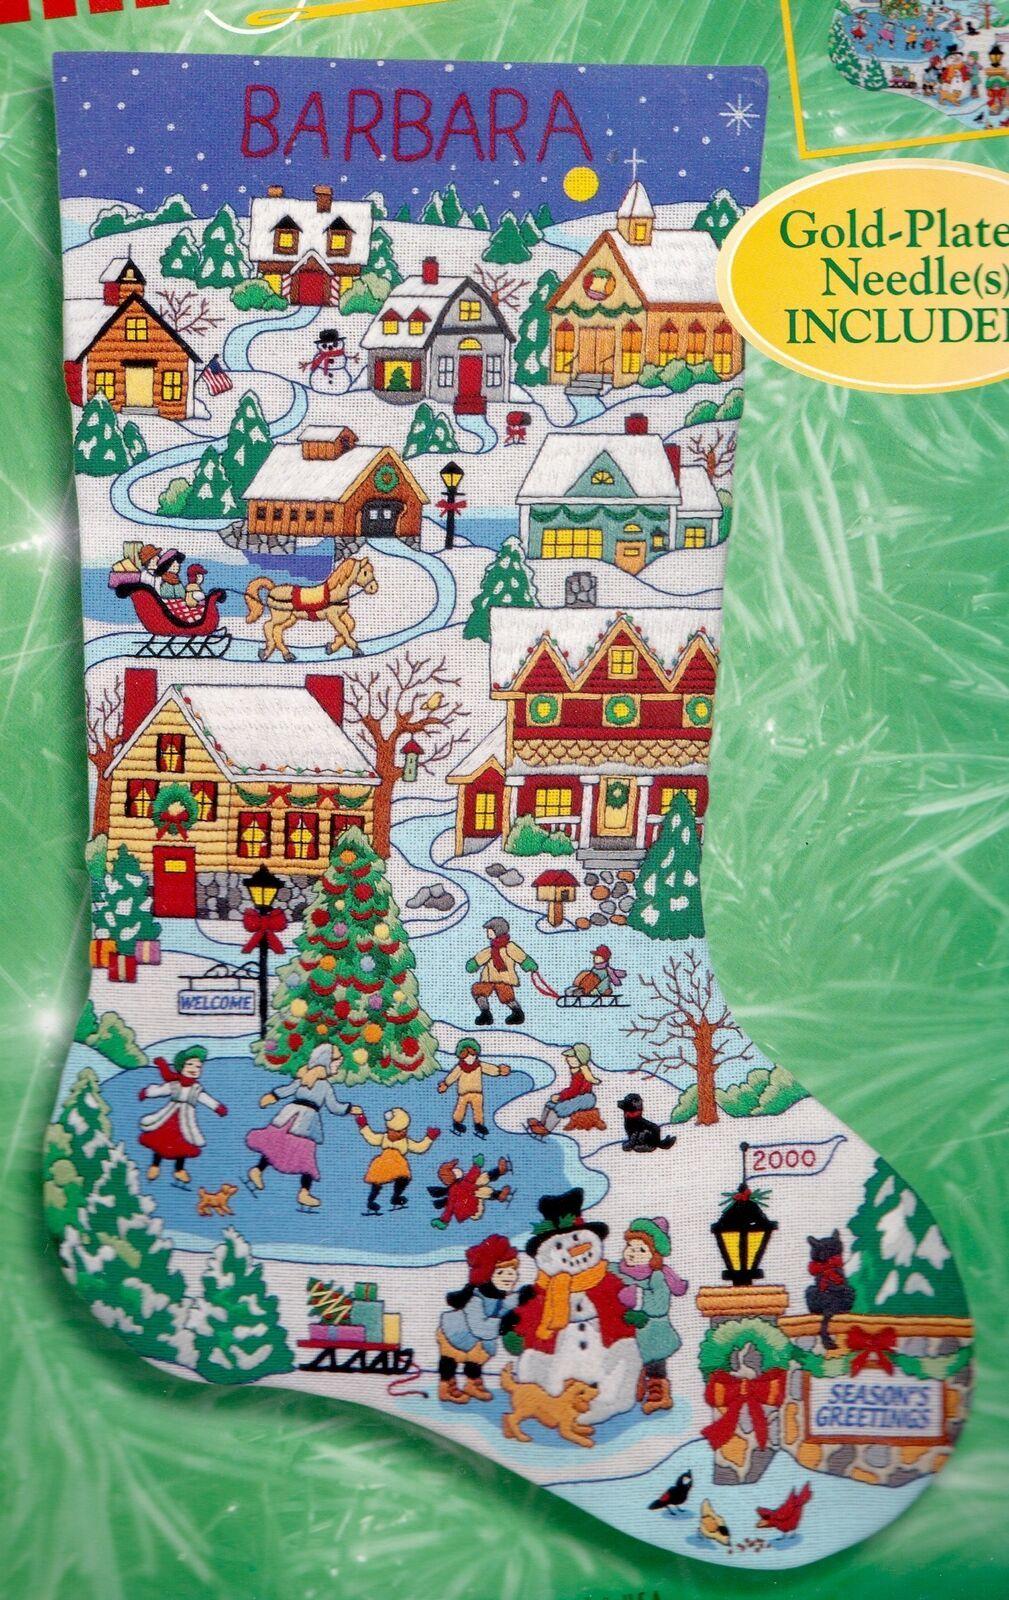 Bucilla Holiday Scenes Christmas Village Crewel Embroidery Stocking Kit 84302 - $232.95